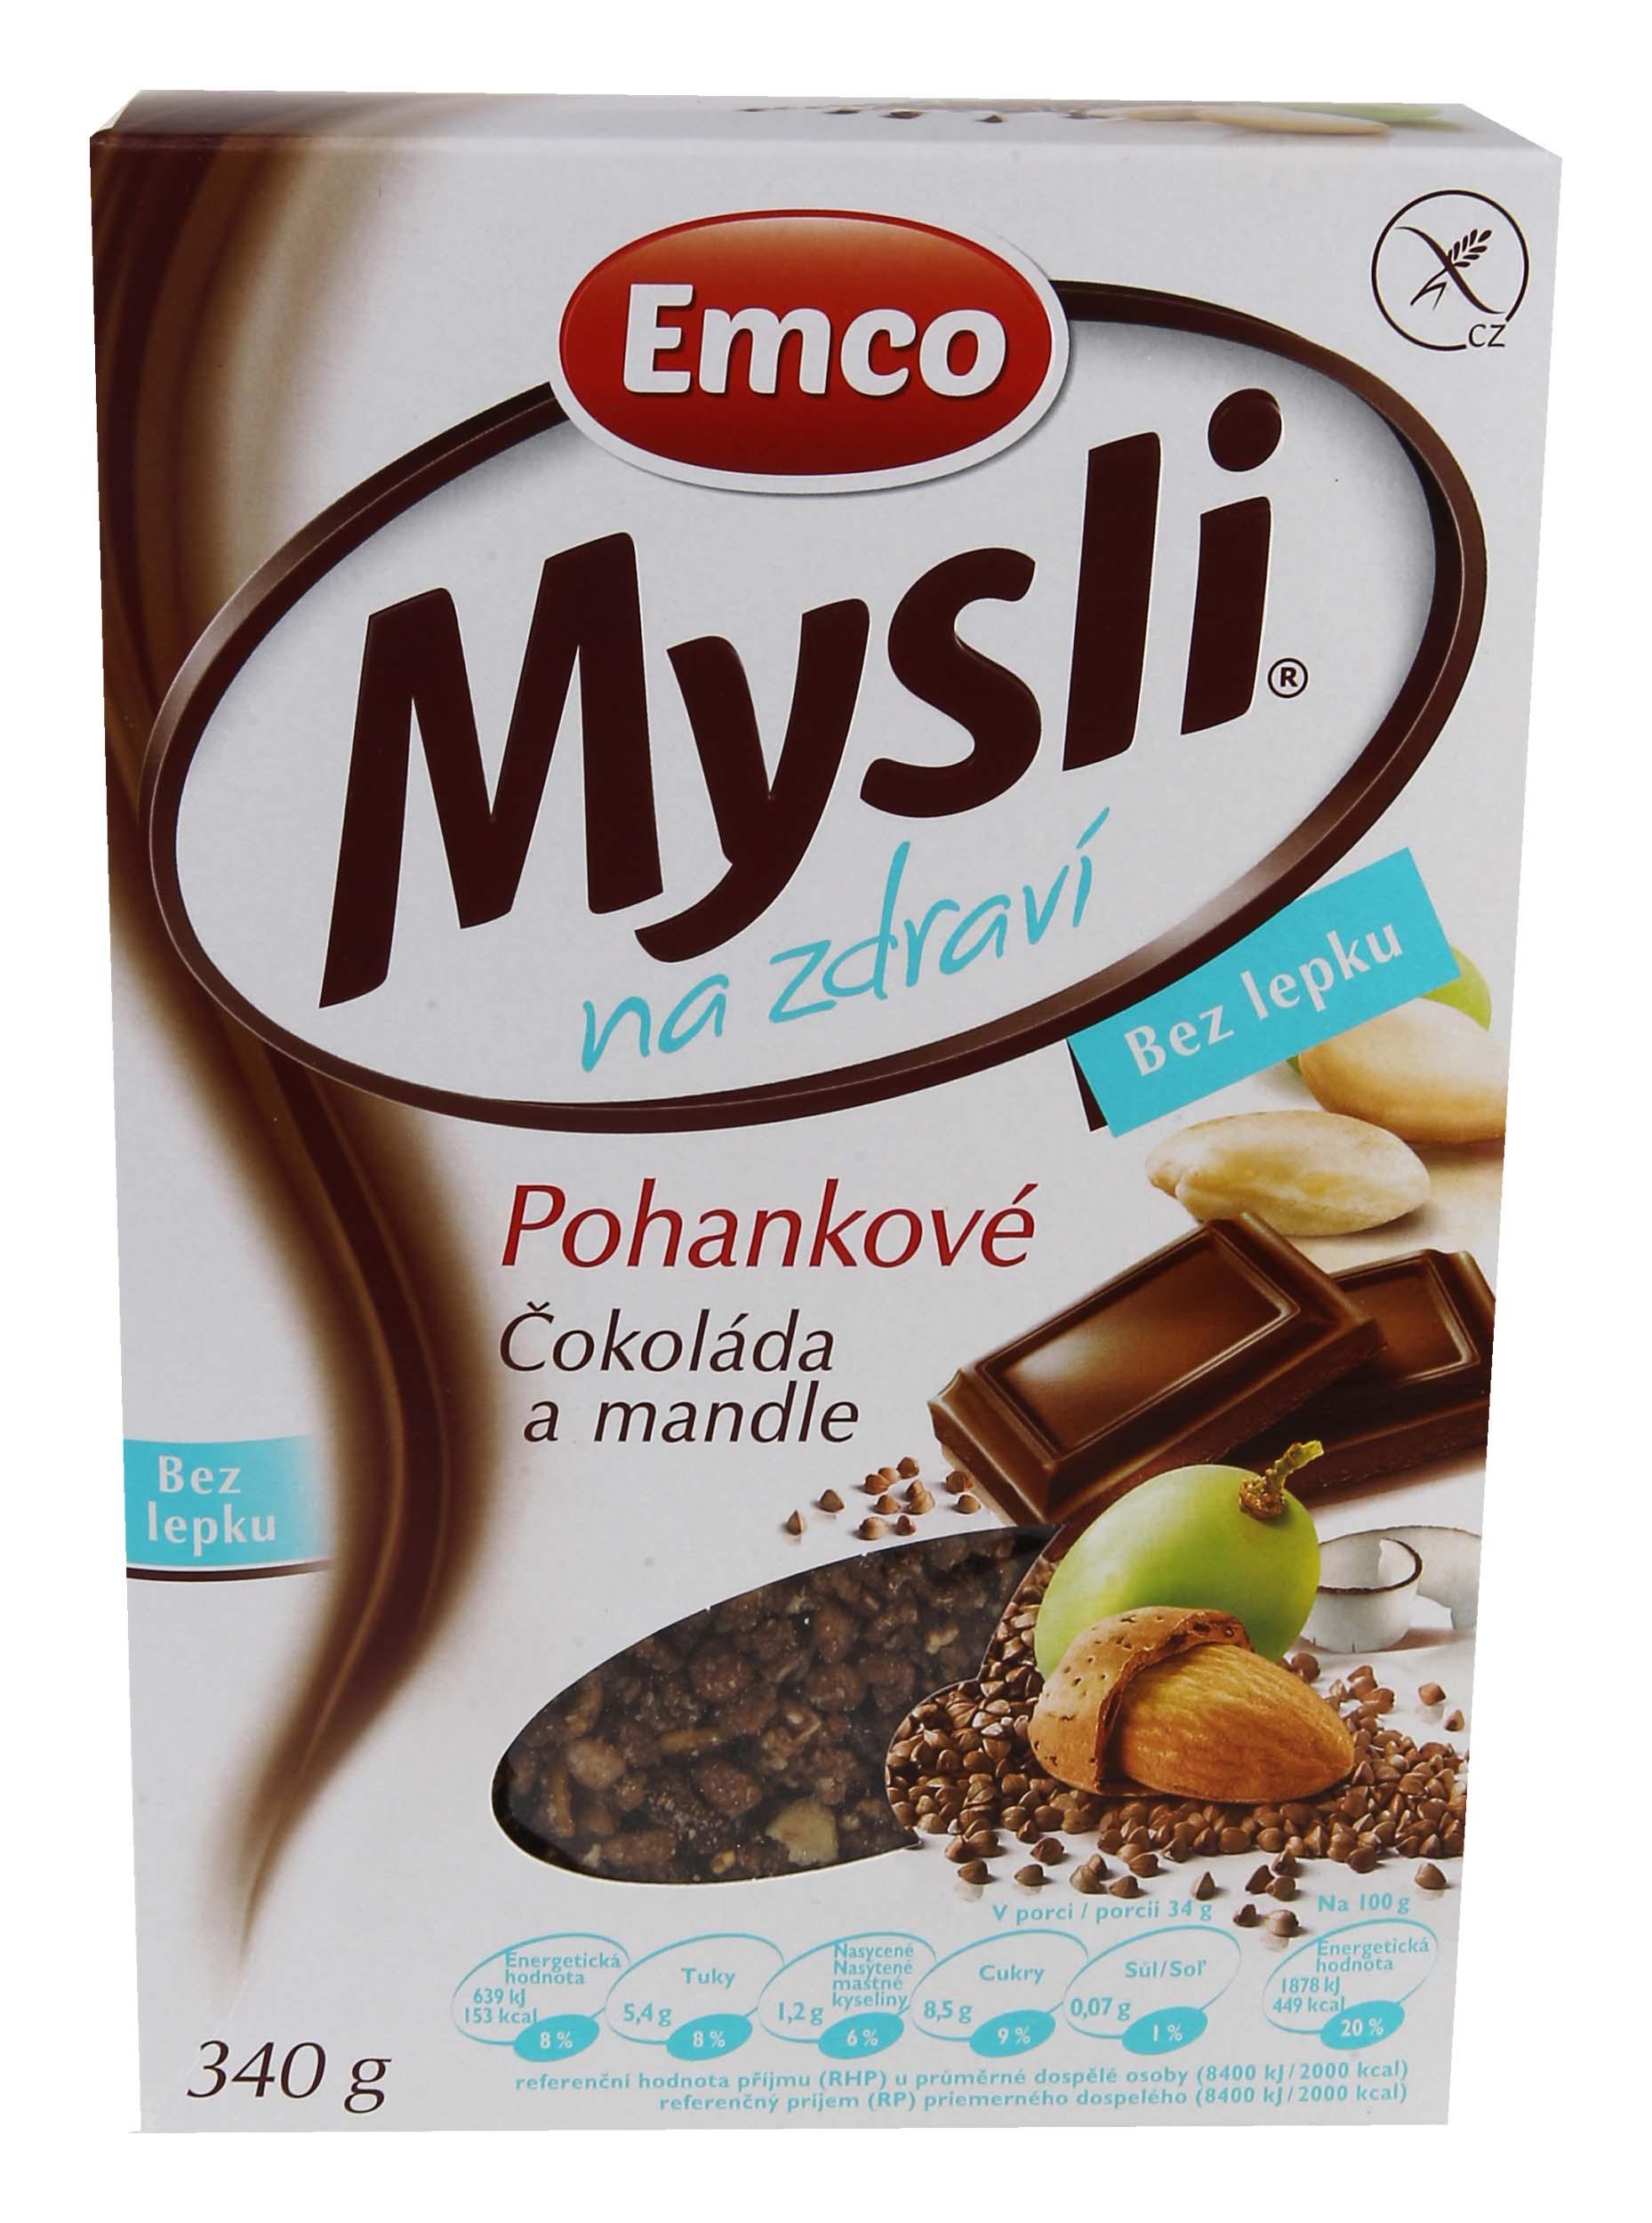 EMCO Mysli na zdraví Pohankové Čokoláda amandle 340g bez lepku